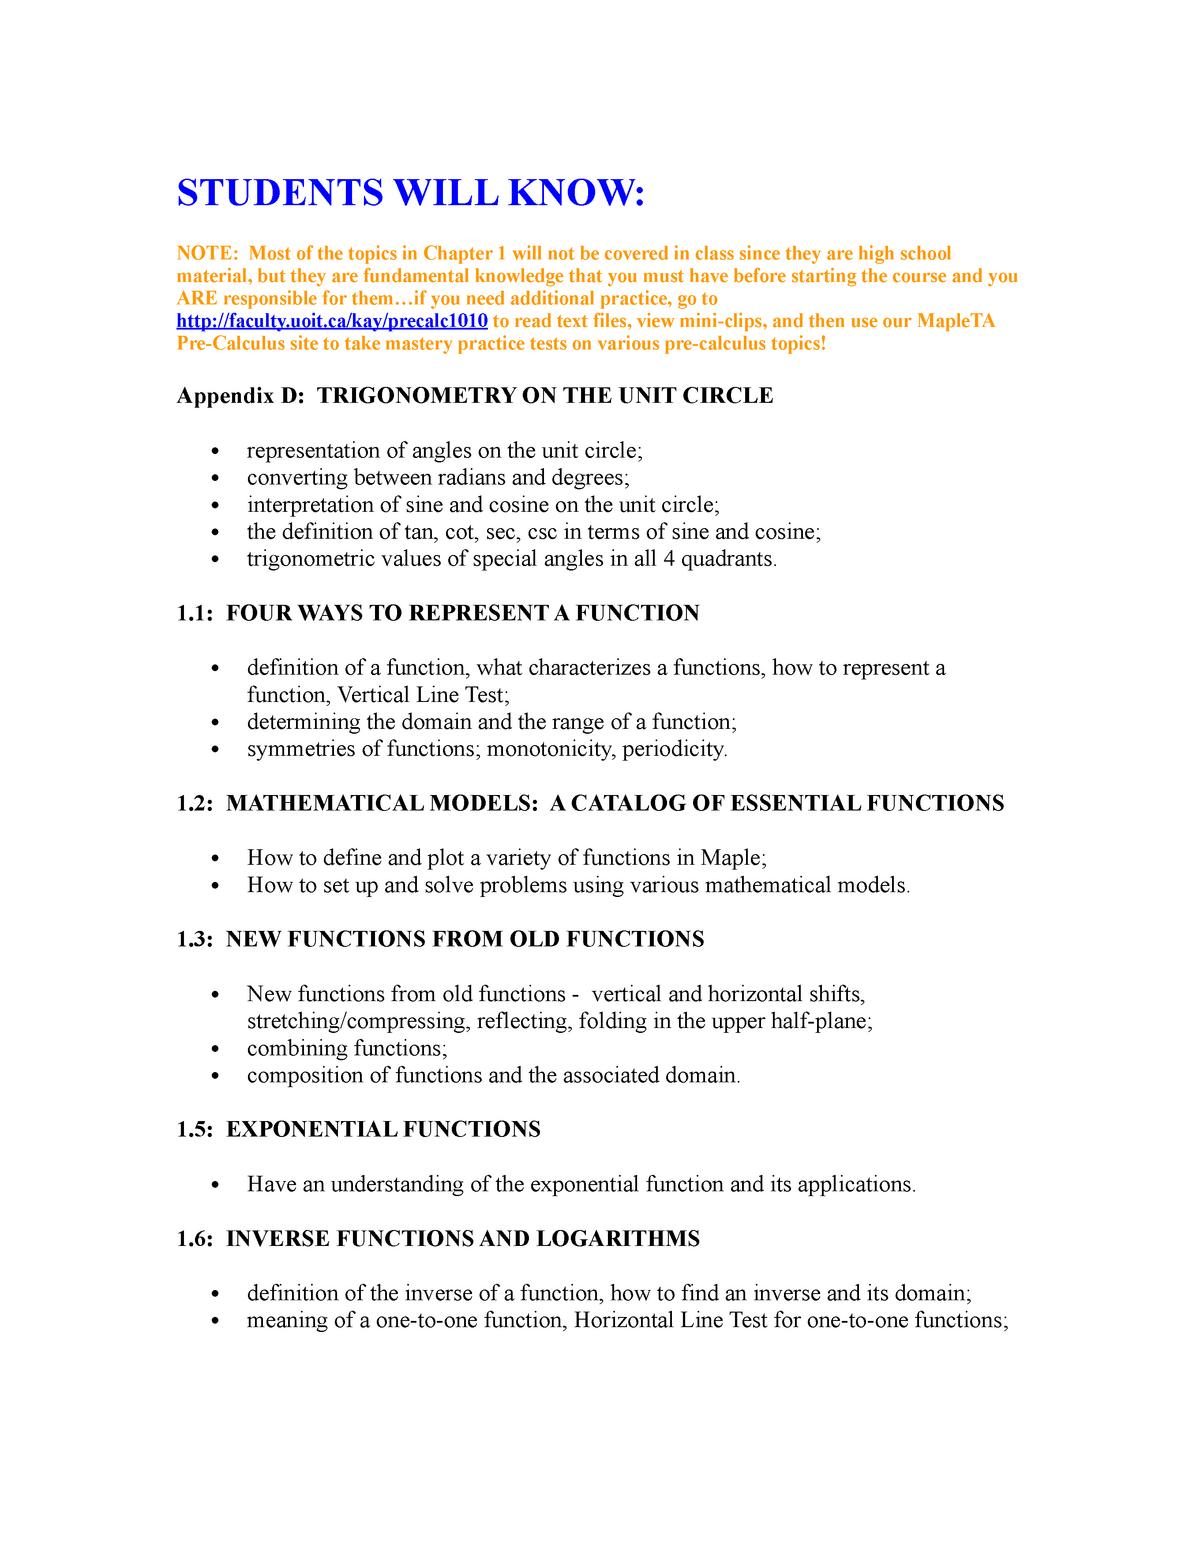 Calculus I First Week Homework Questions - MATH1010U